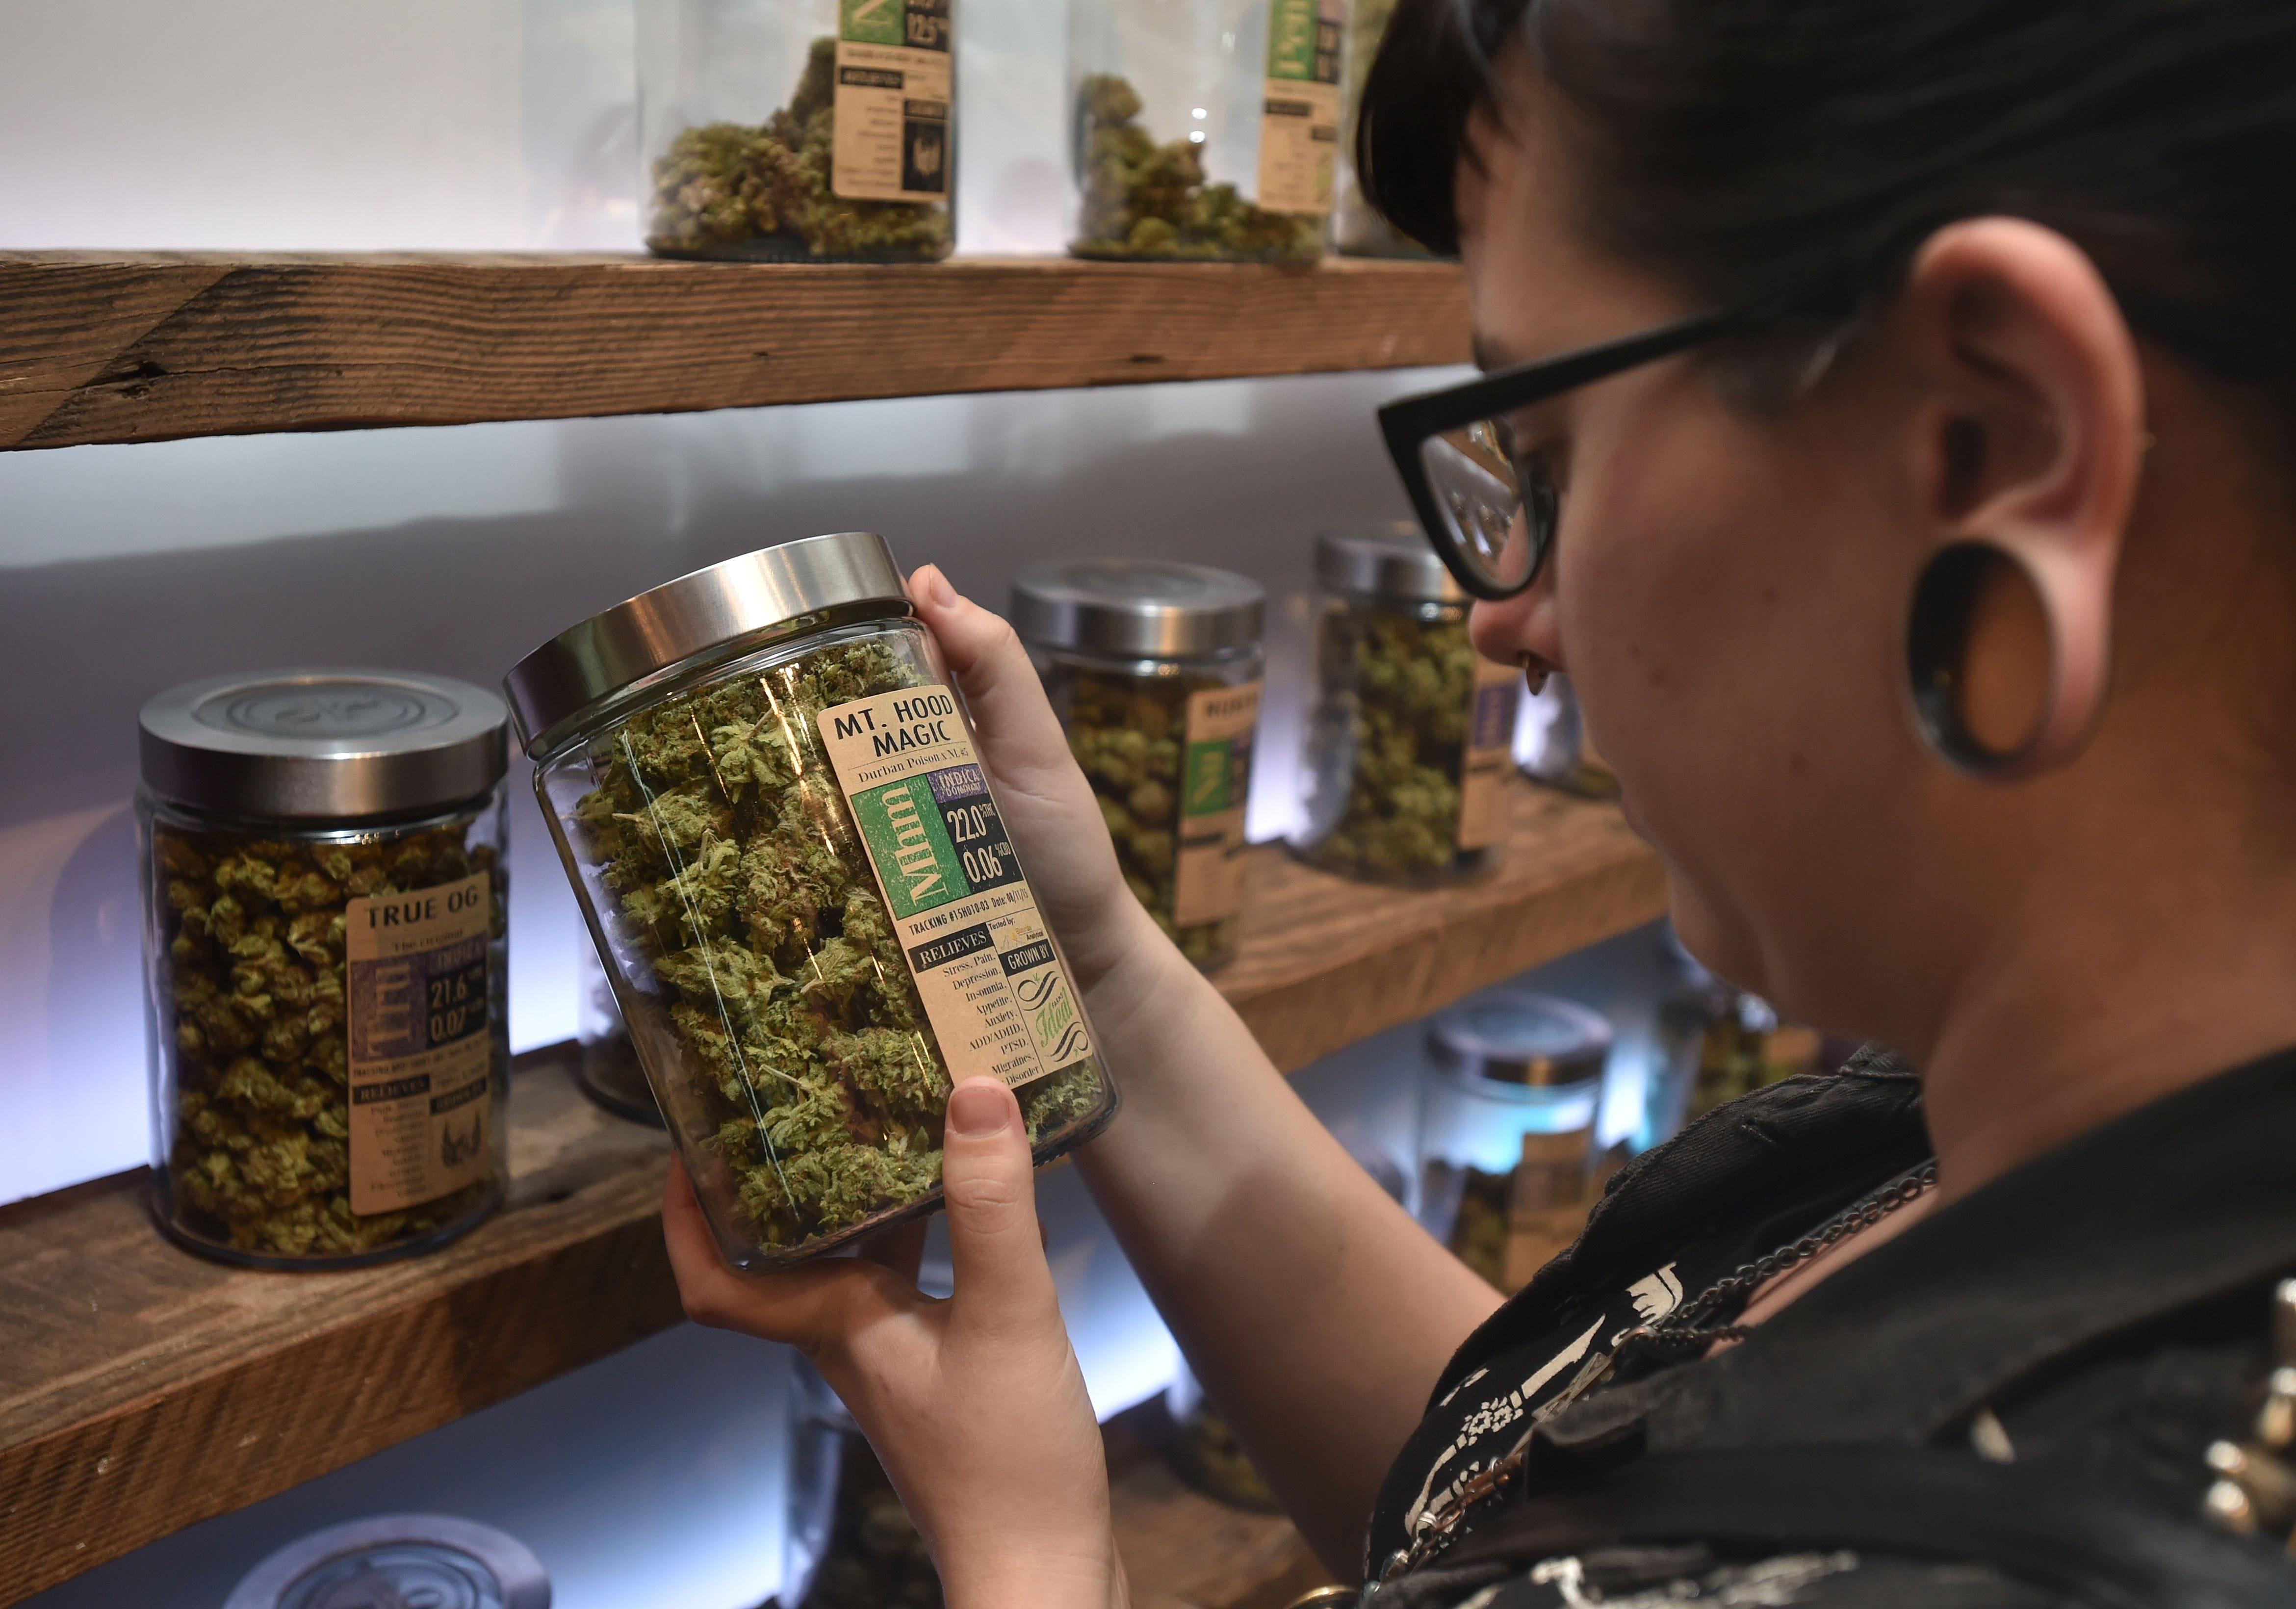 11 states least likely to legalize marijuana